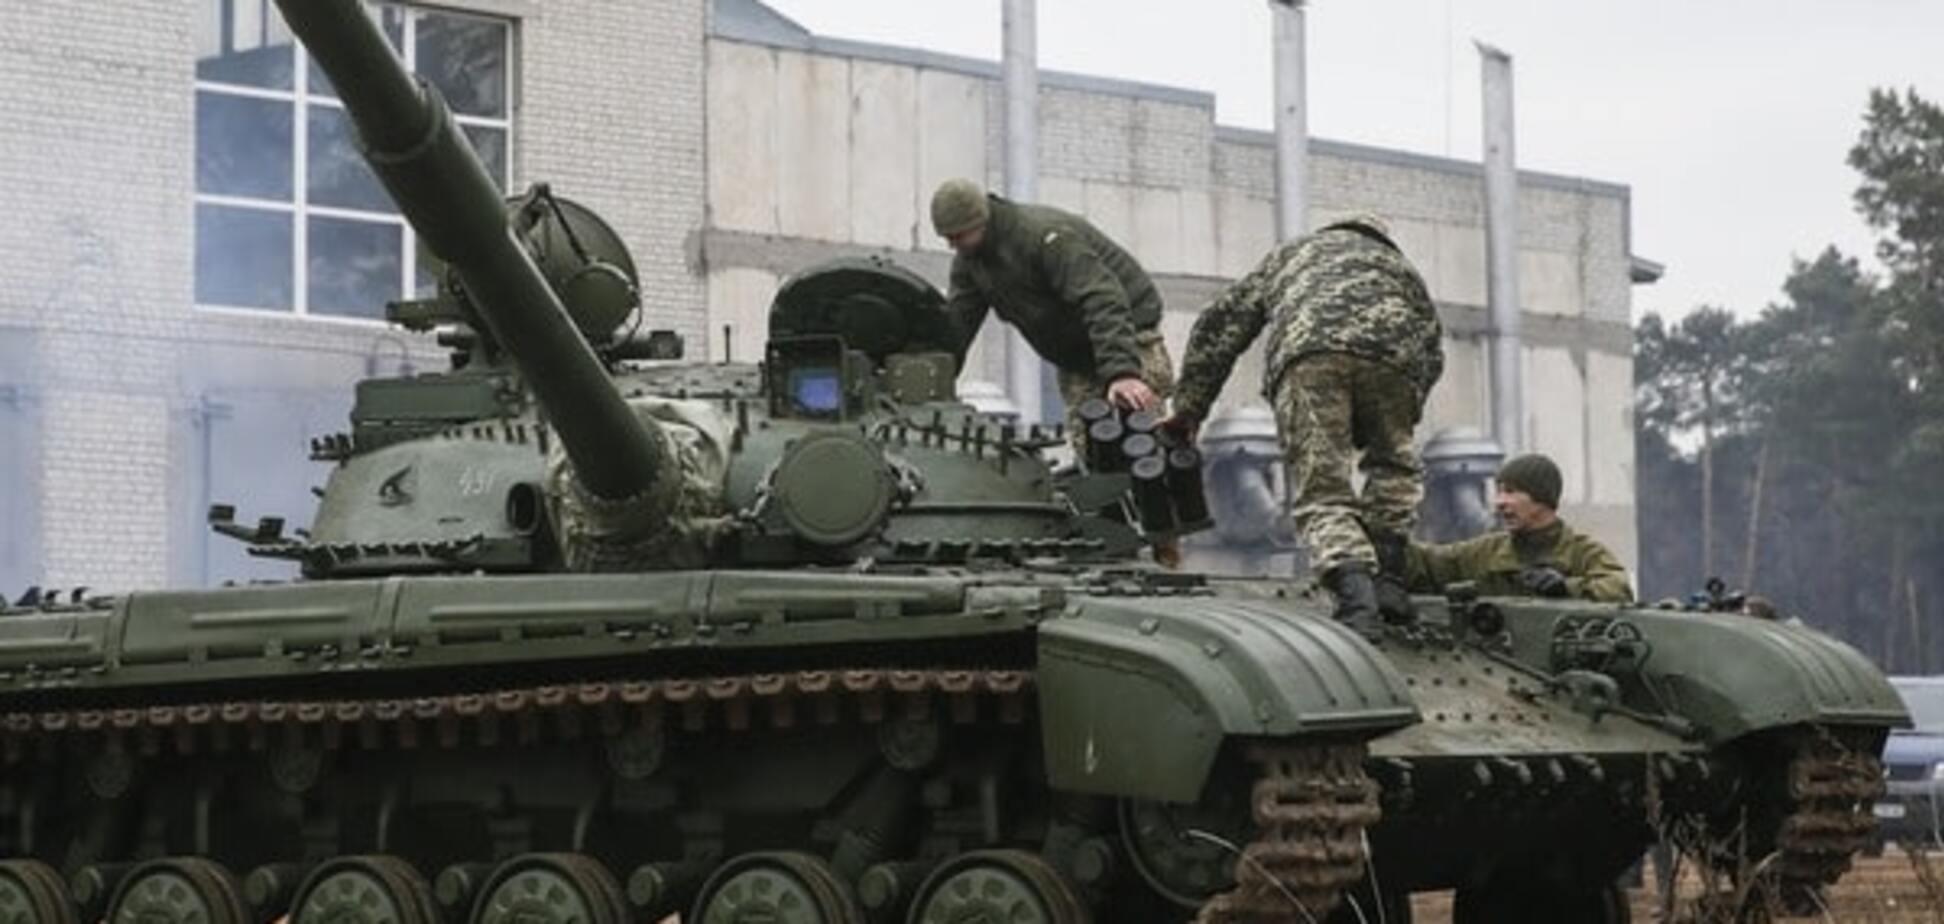 Терористи за добу випустили по силам АТО не менше 12 мін